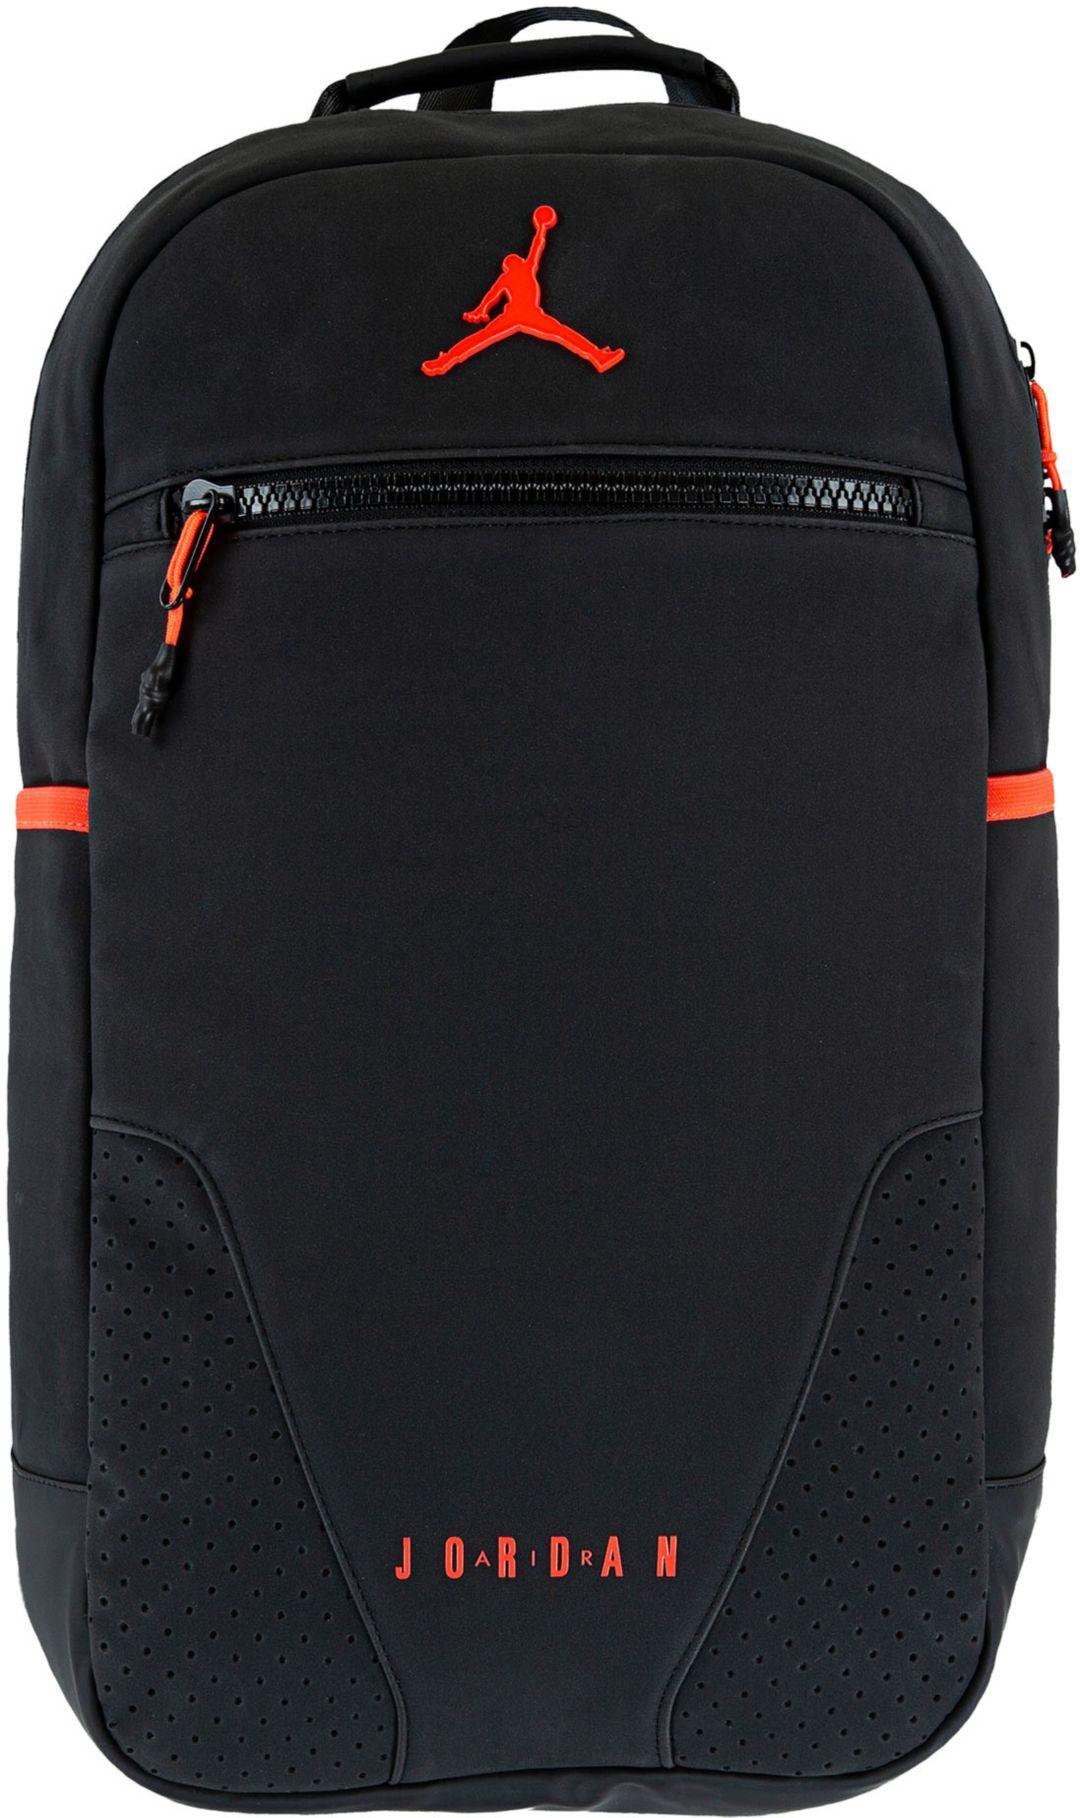 separation shoes 0fb9a 85aa0 Jordan Retro 6 Backpack 1